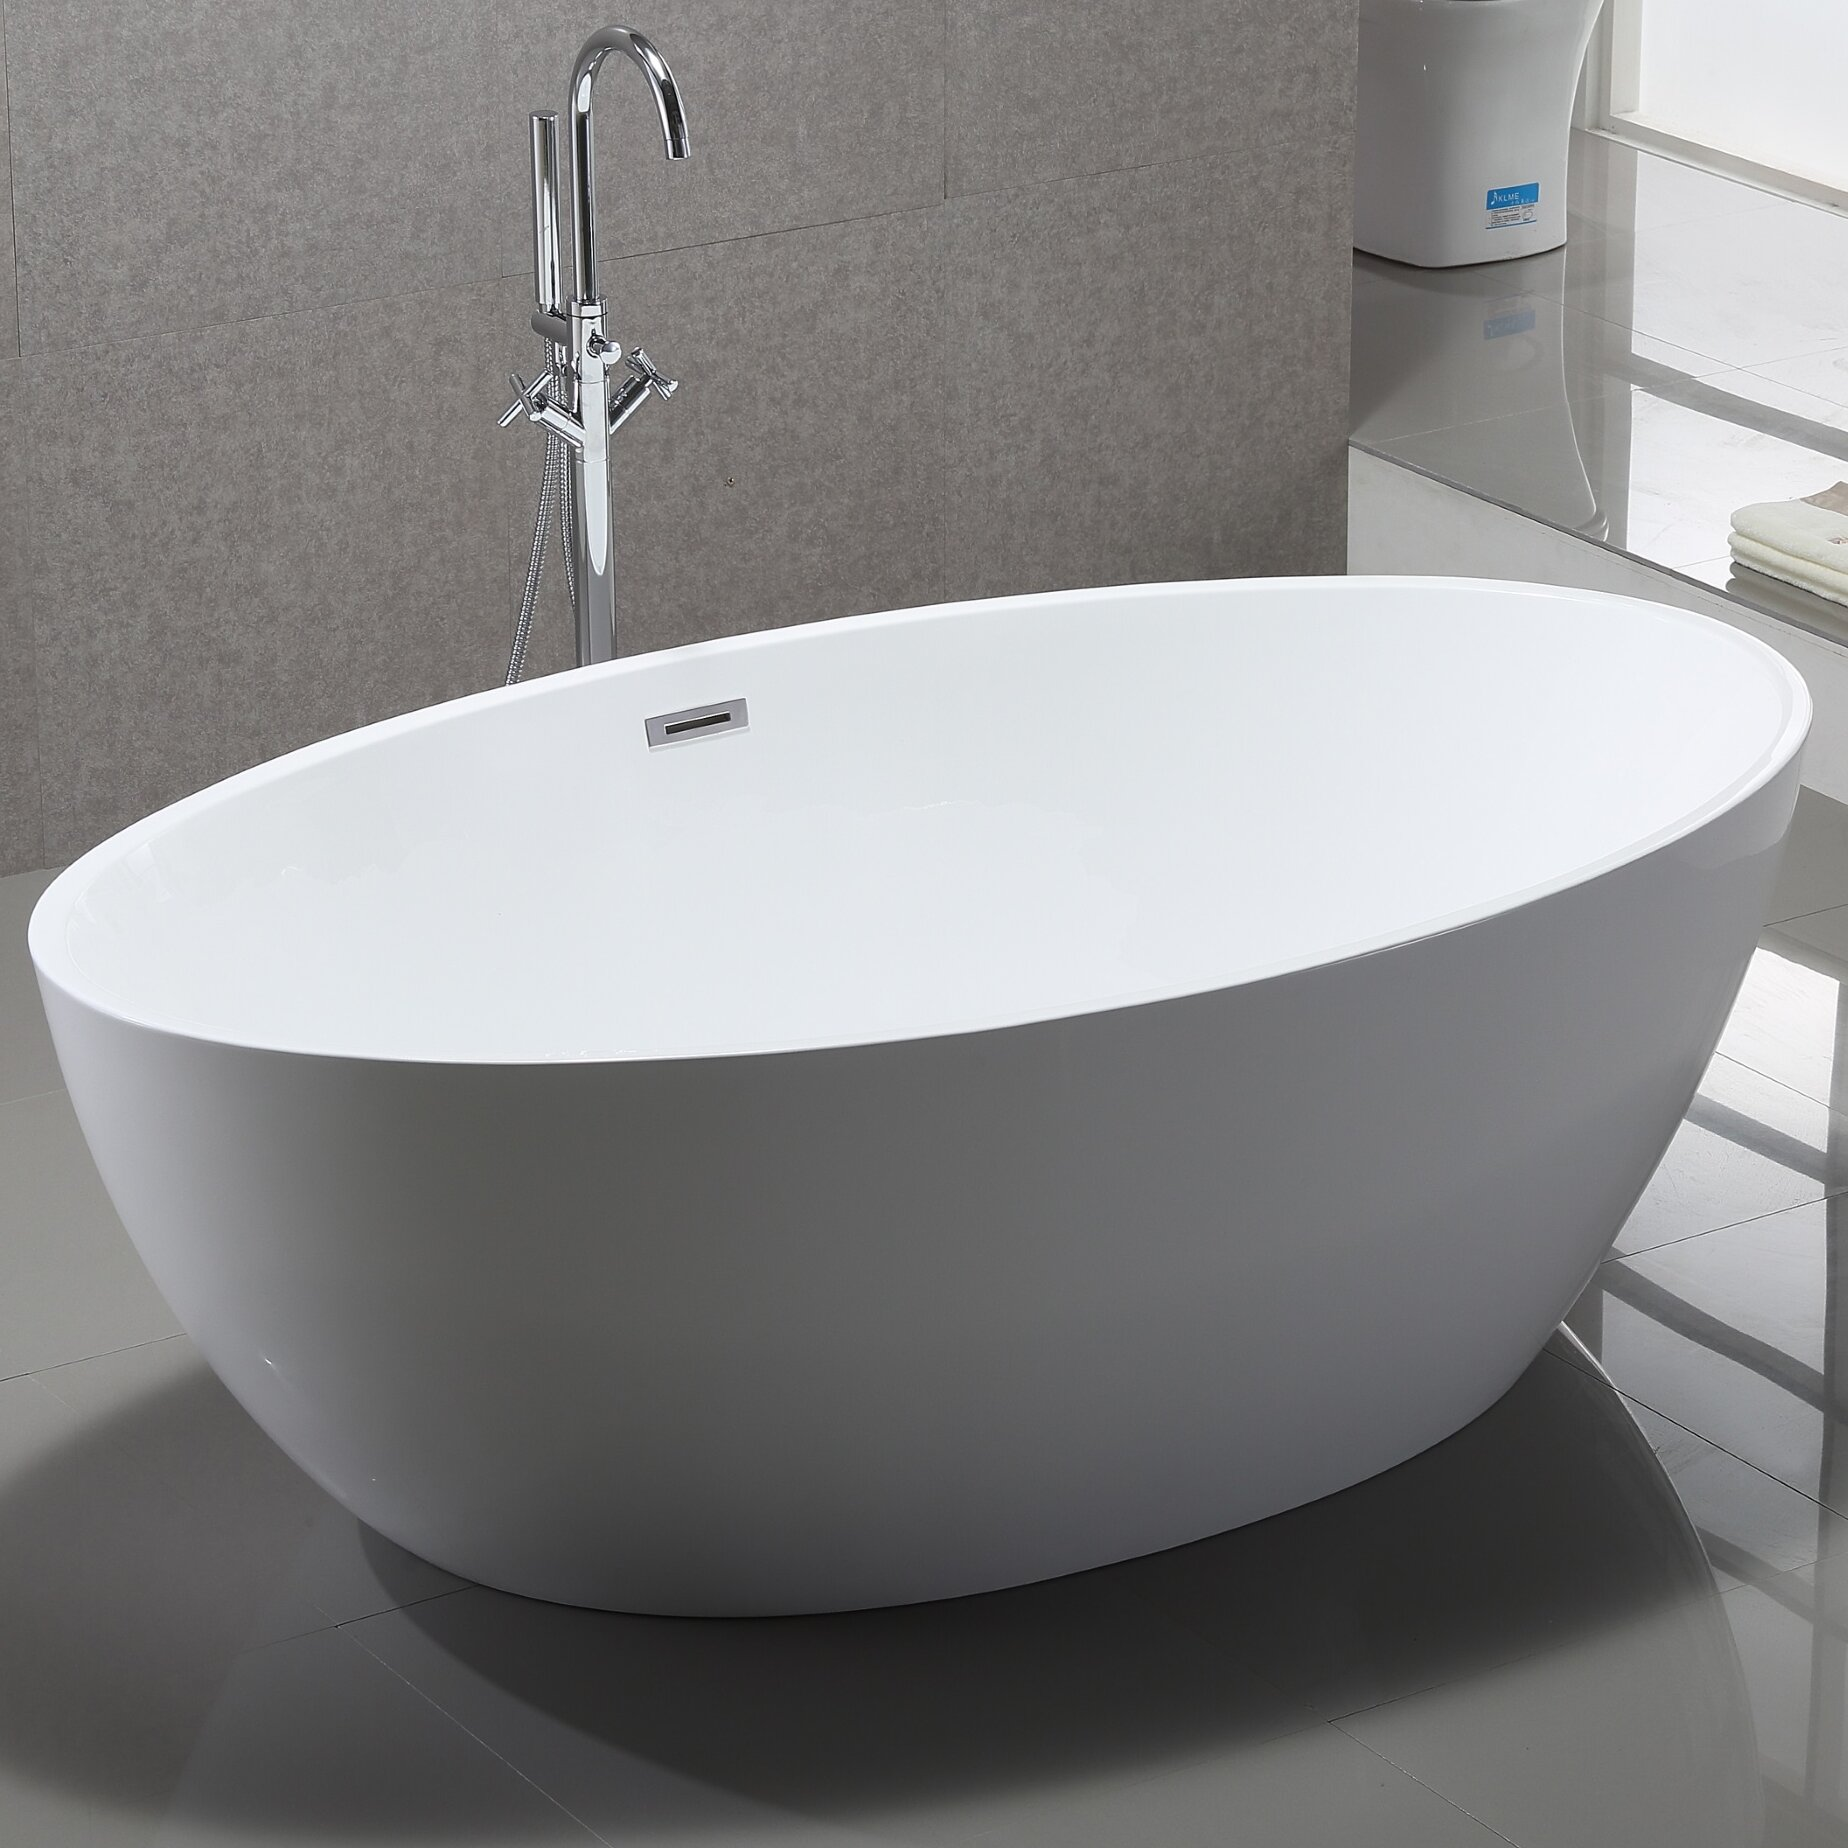 soaking improvement freestanding pdx wyndham bathtub x duchess company home restoria